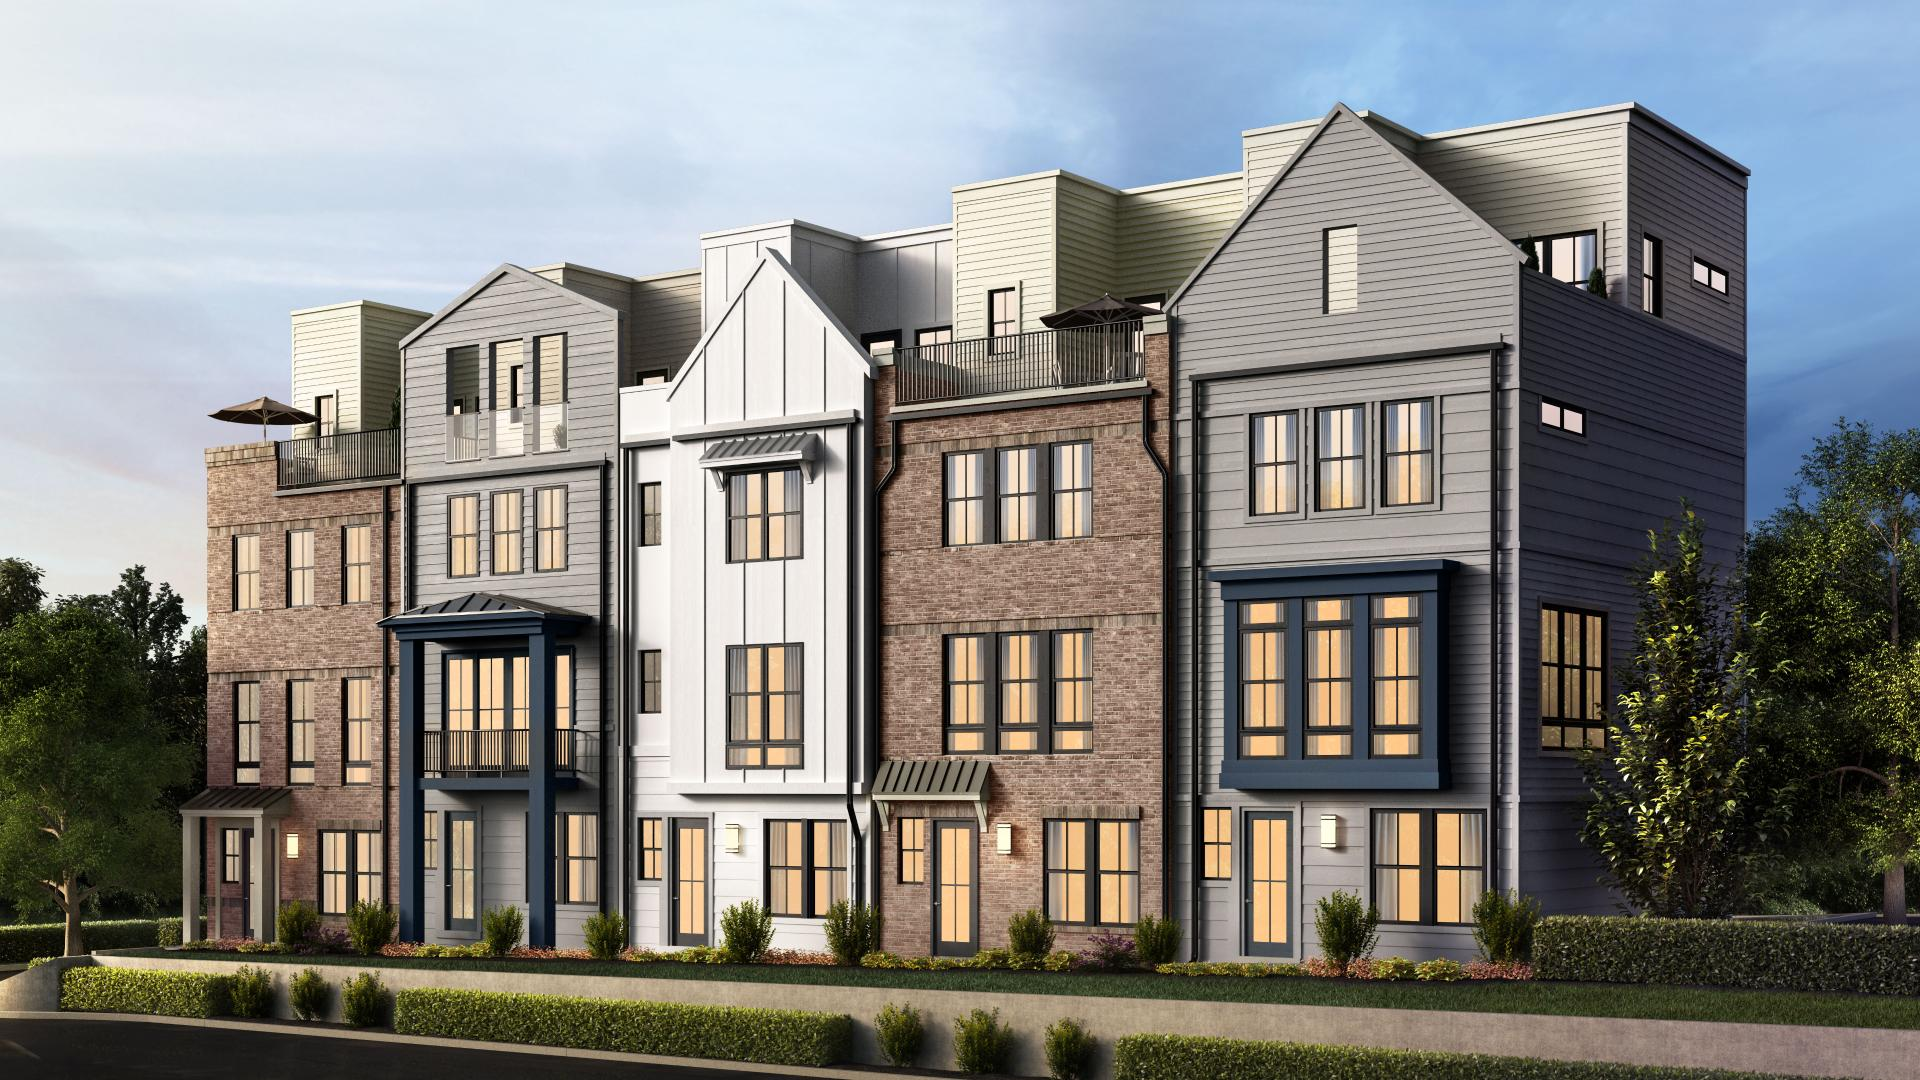 The Winn home design